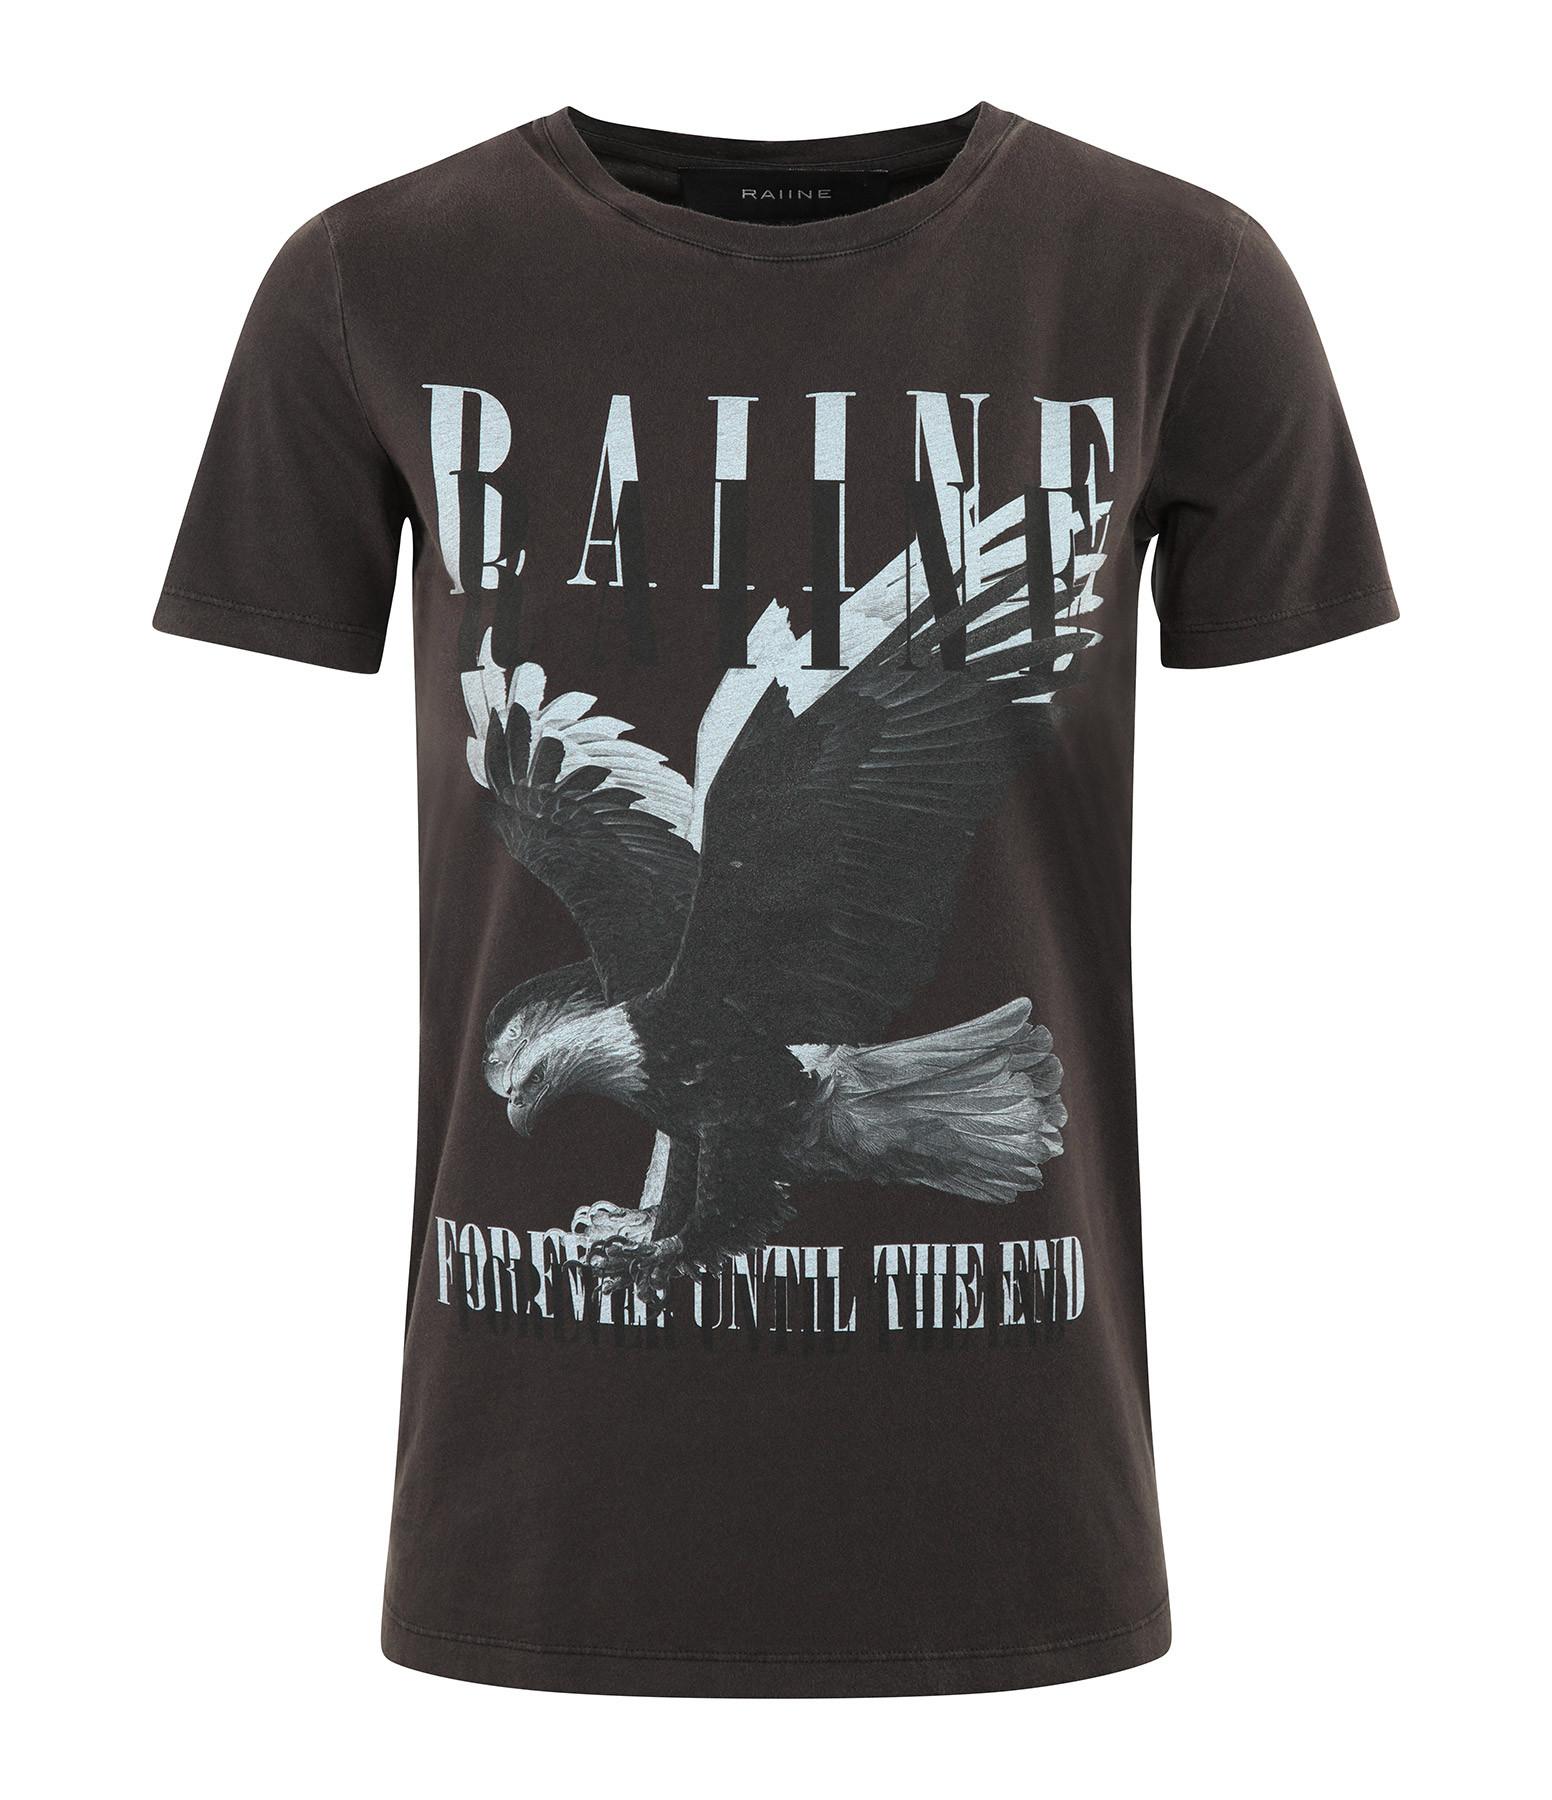 RAIINE - Tee-shirt Darby Coton Charbon